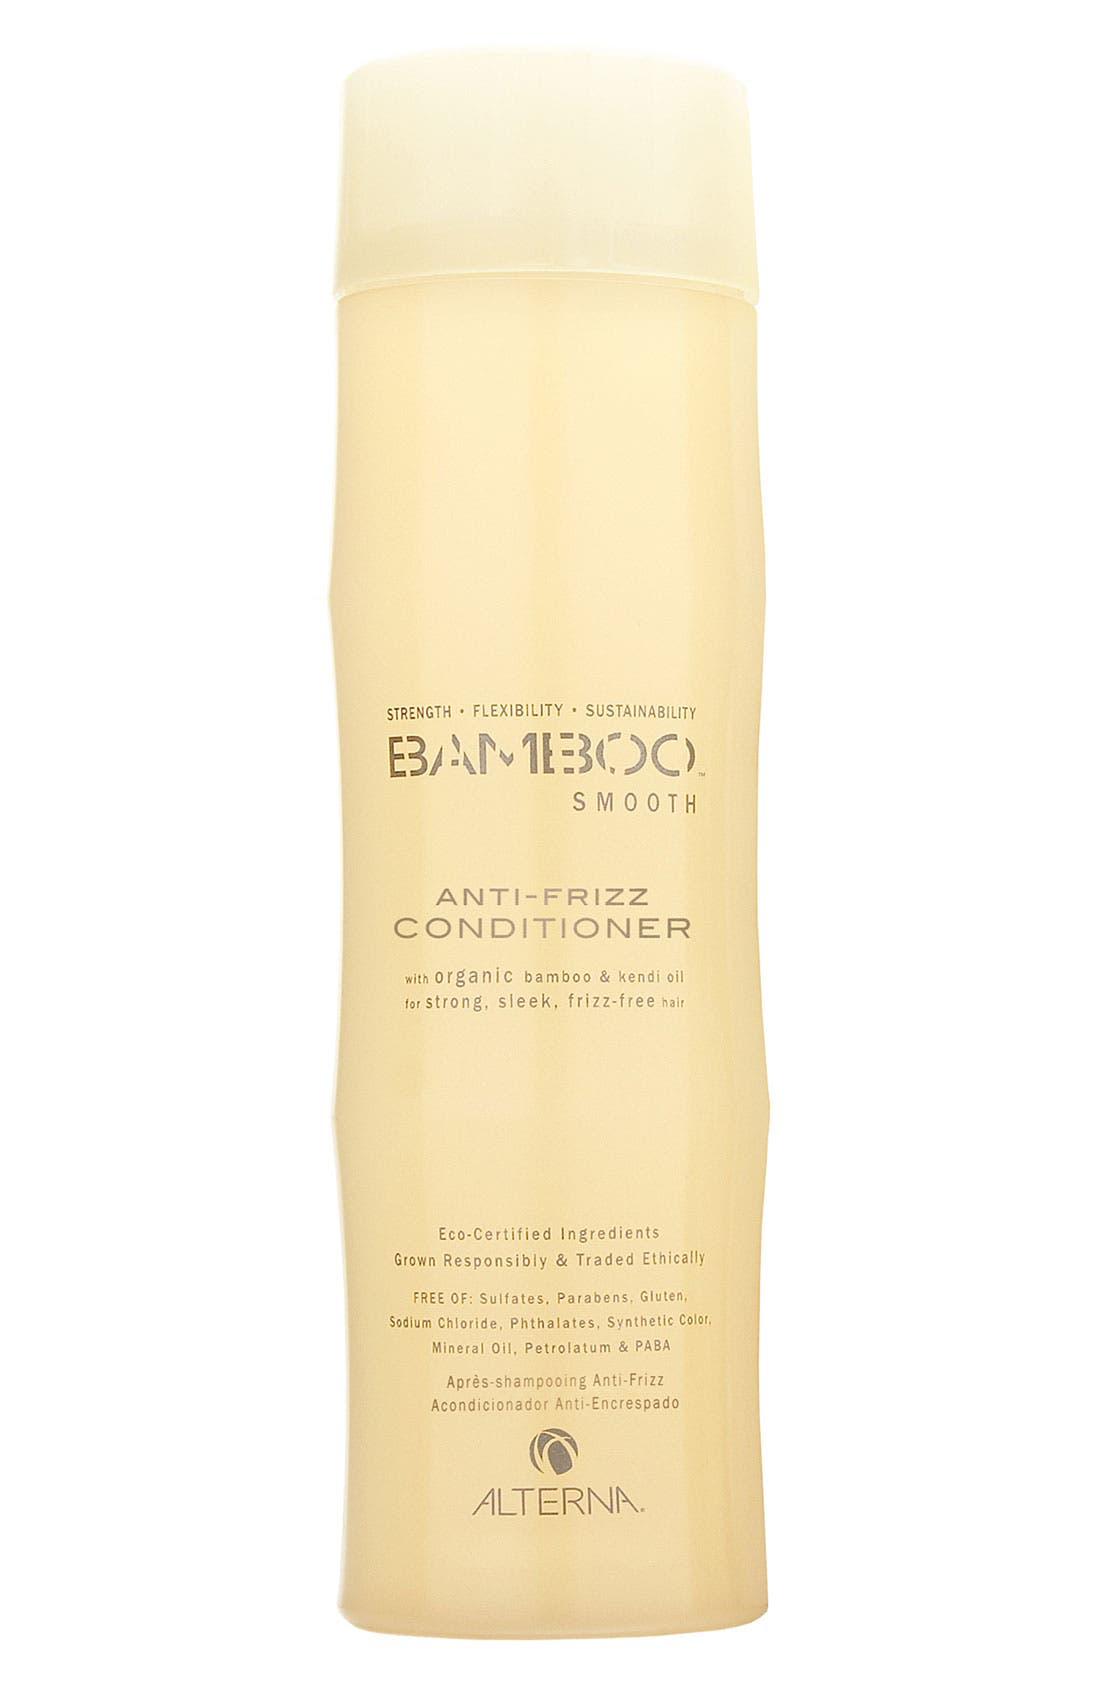 ALTERNA® Bamboo Smooth Anti-Frizz Conditioner